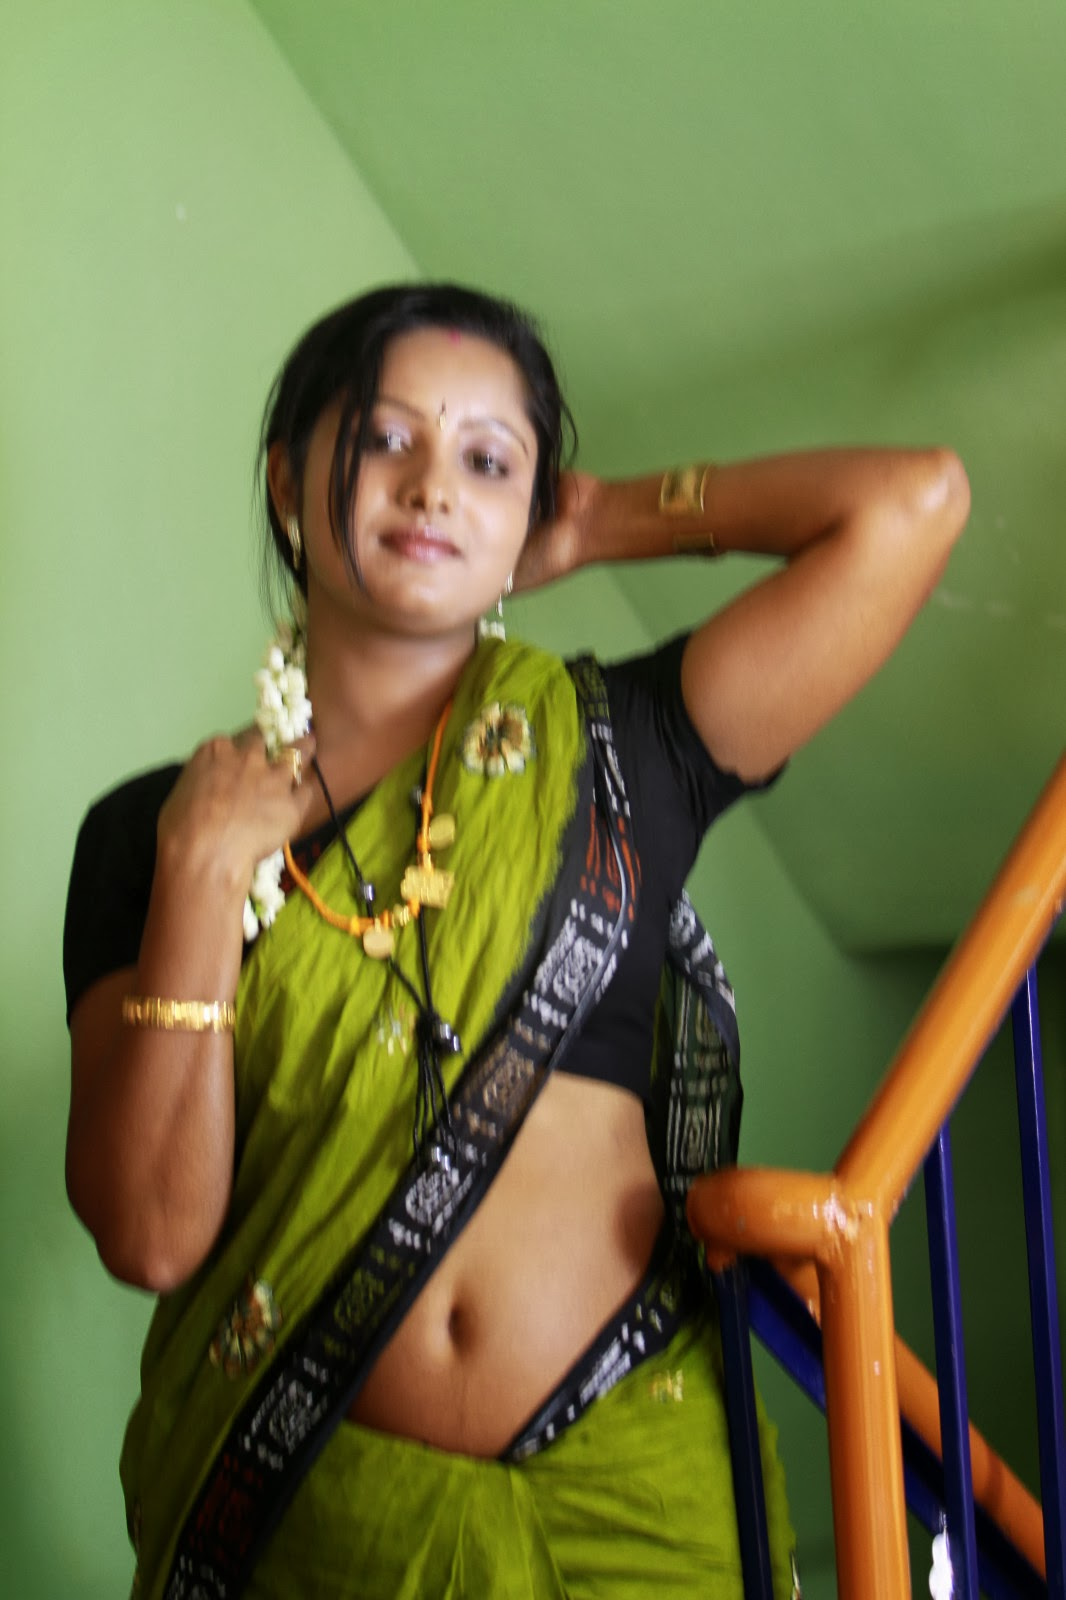 Mallu Sexy Aunty Nave In Sareemallu Saree Below Navel -9295